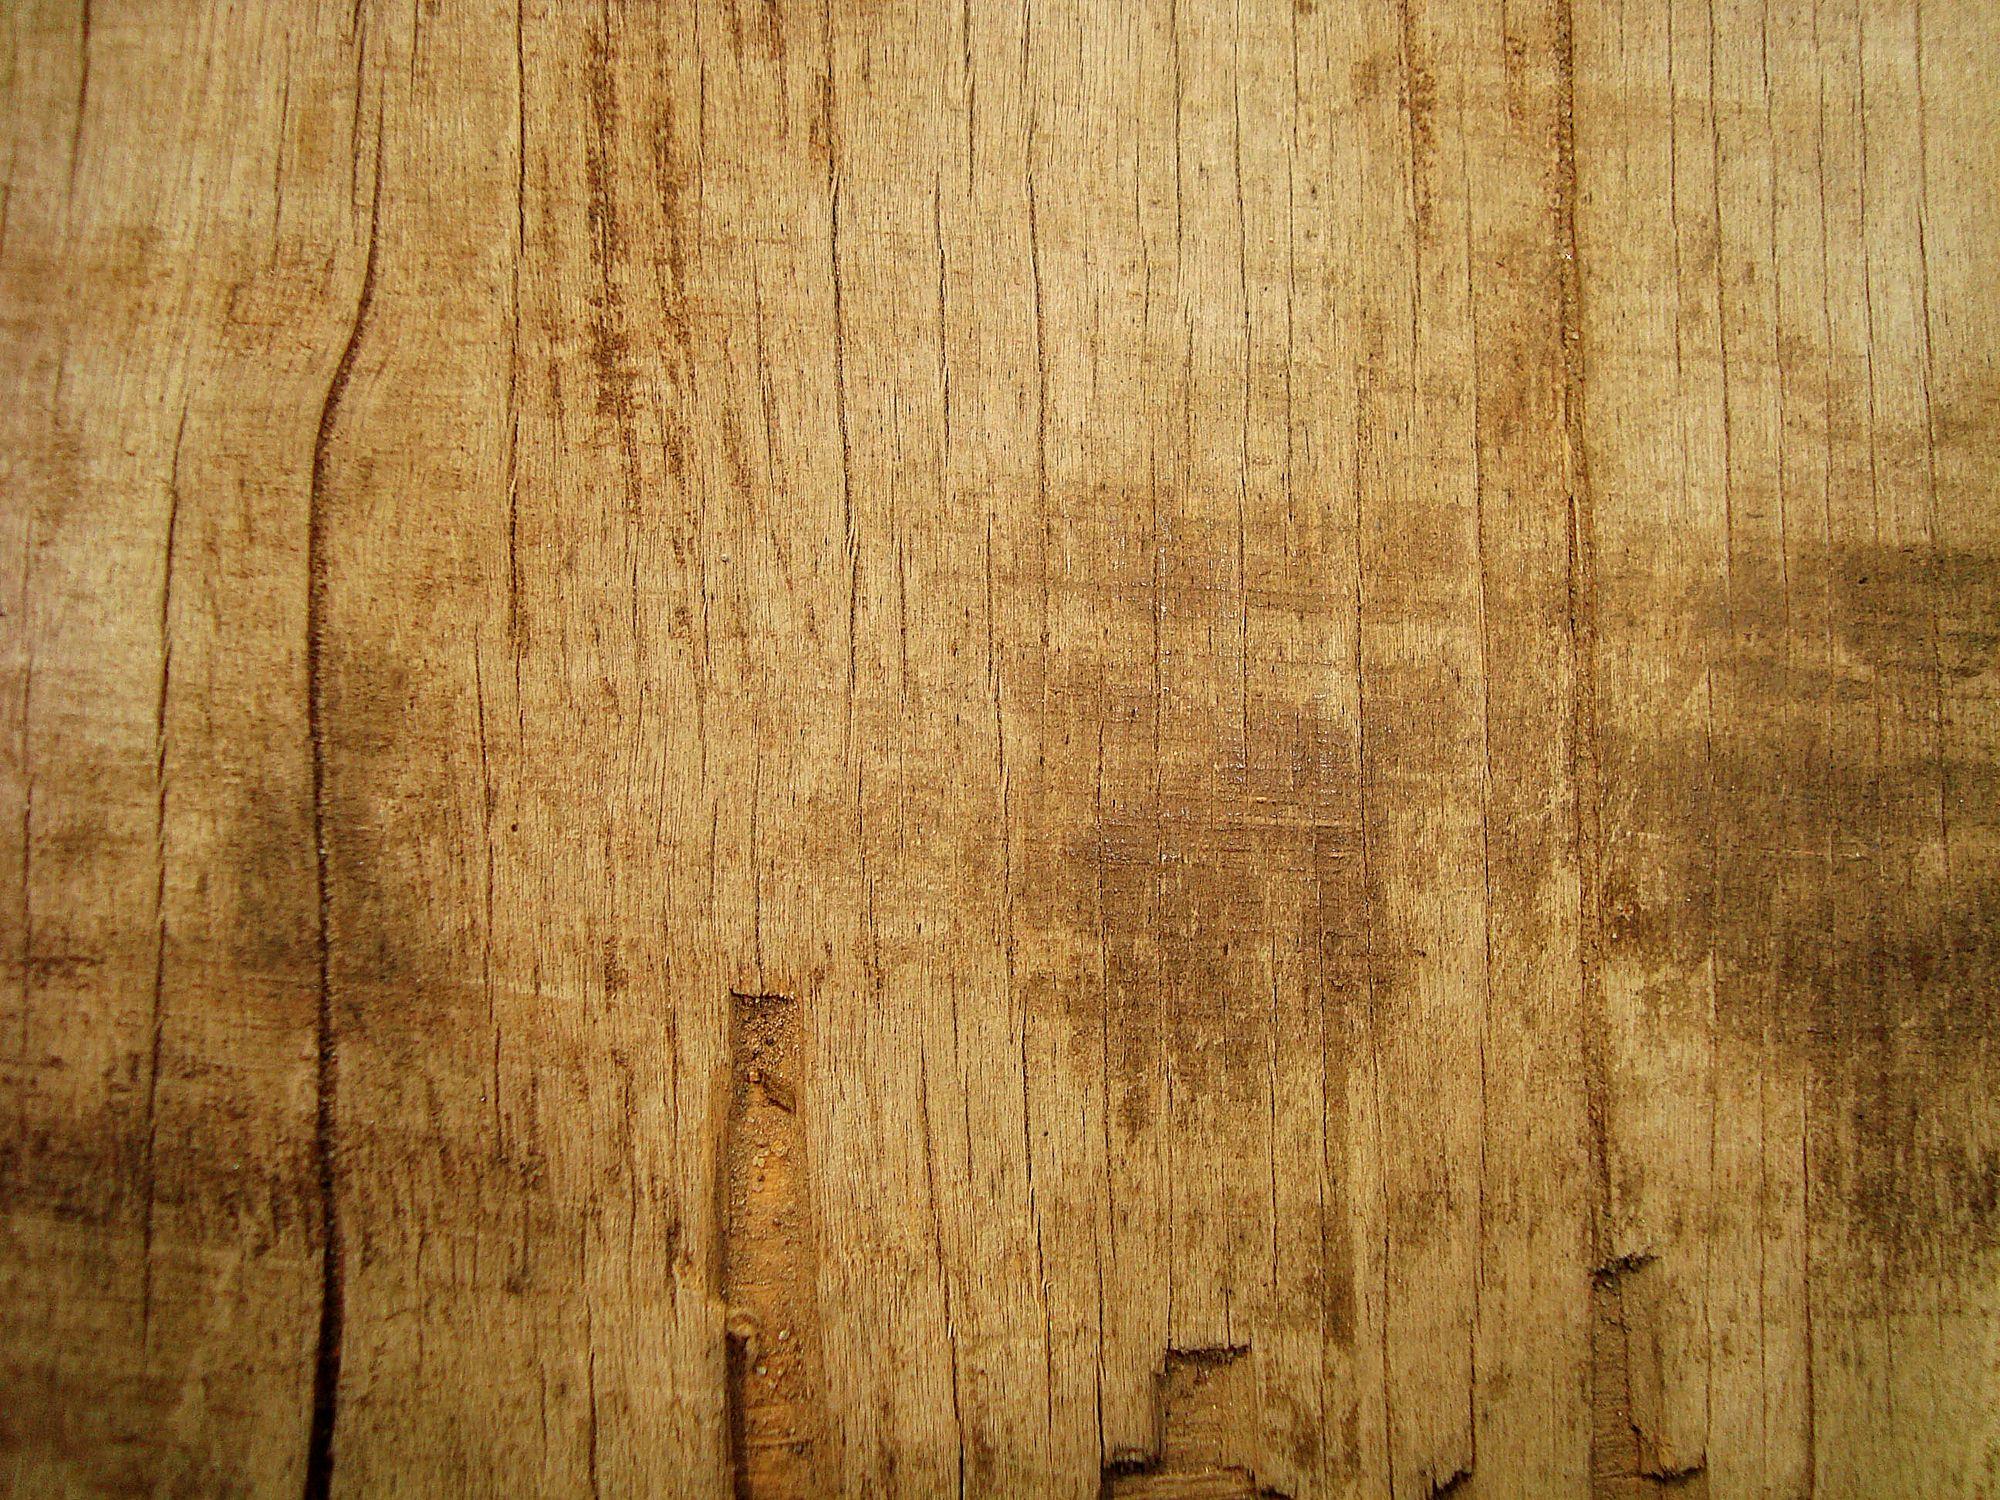 Pics photos wood texture background - Explore Wood Background Wood Texture And More